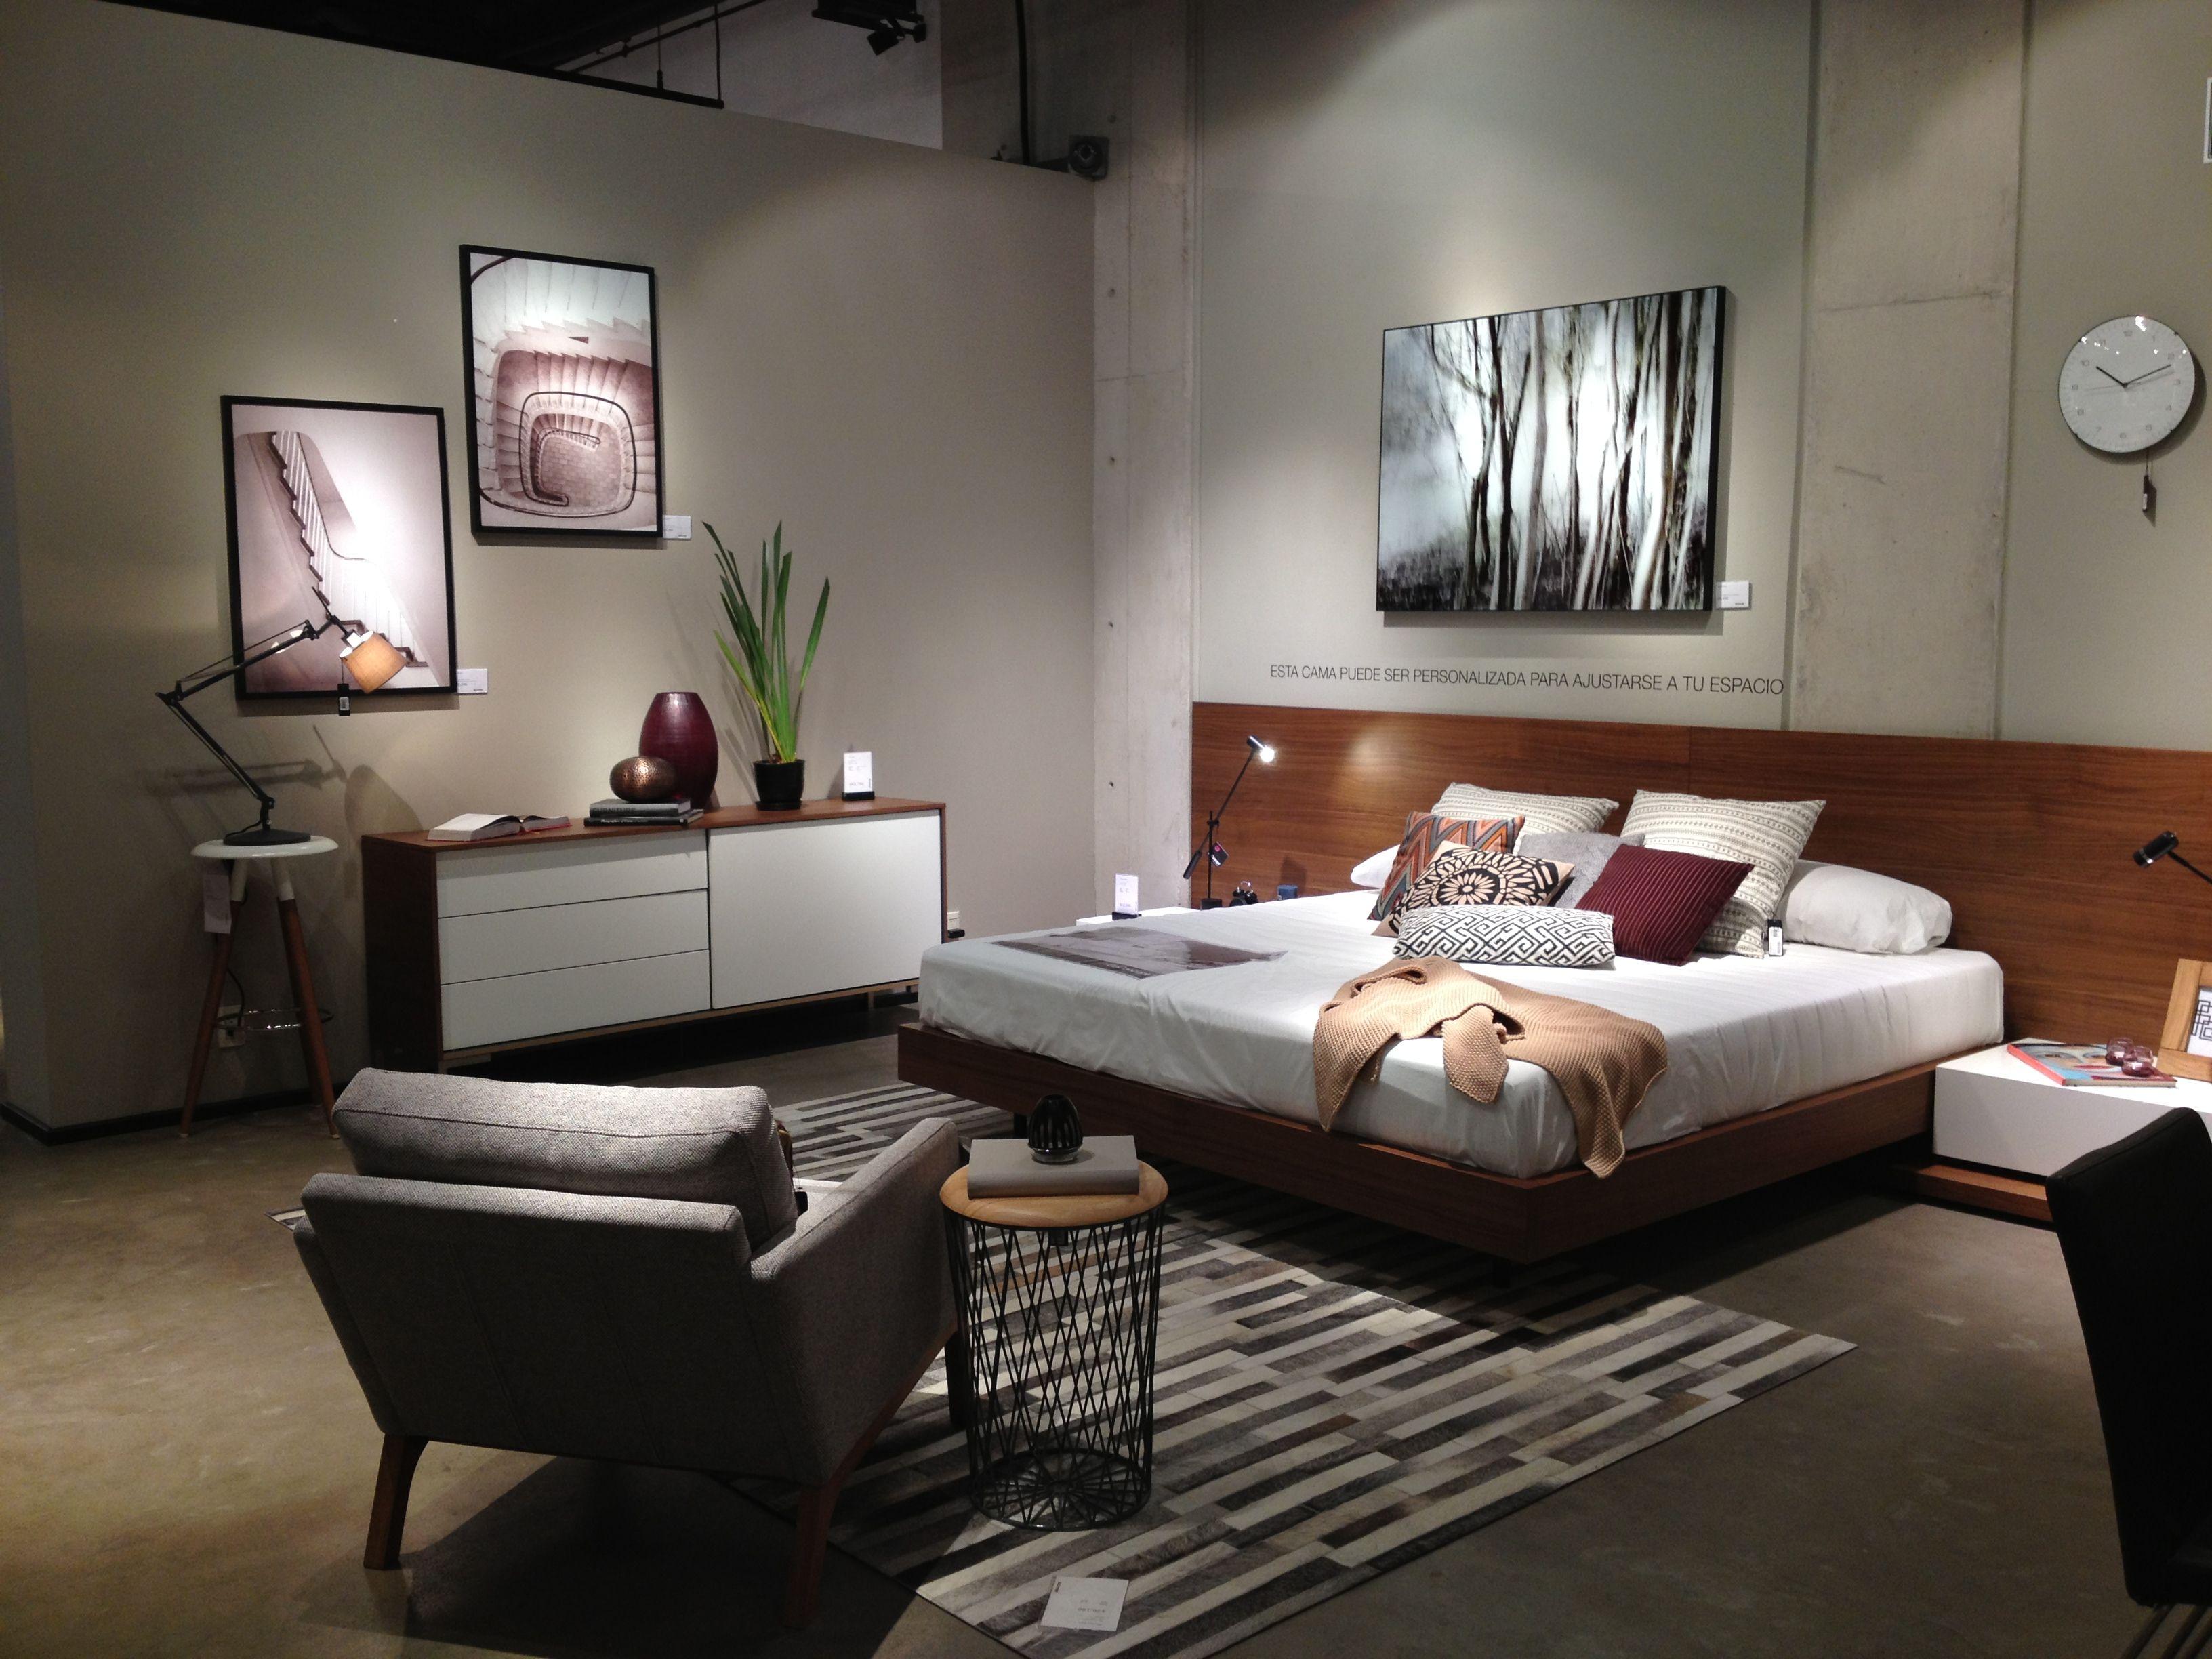 Boconcept guadalajara inspiring showrooms pinterest Beo concept